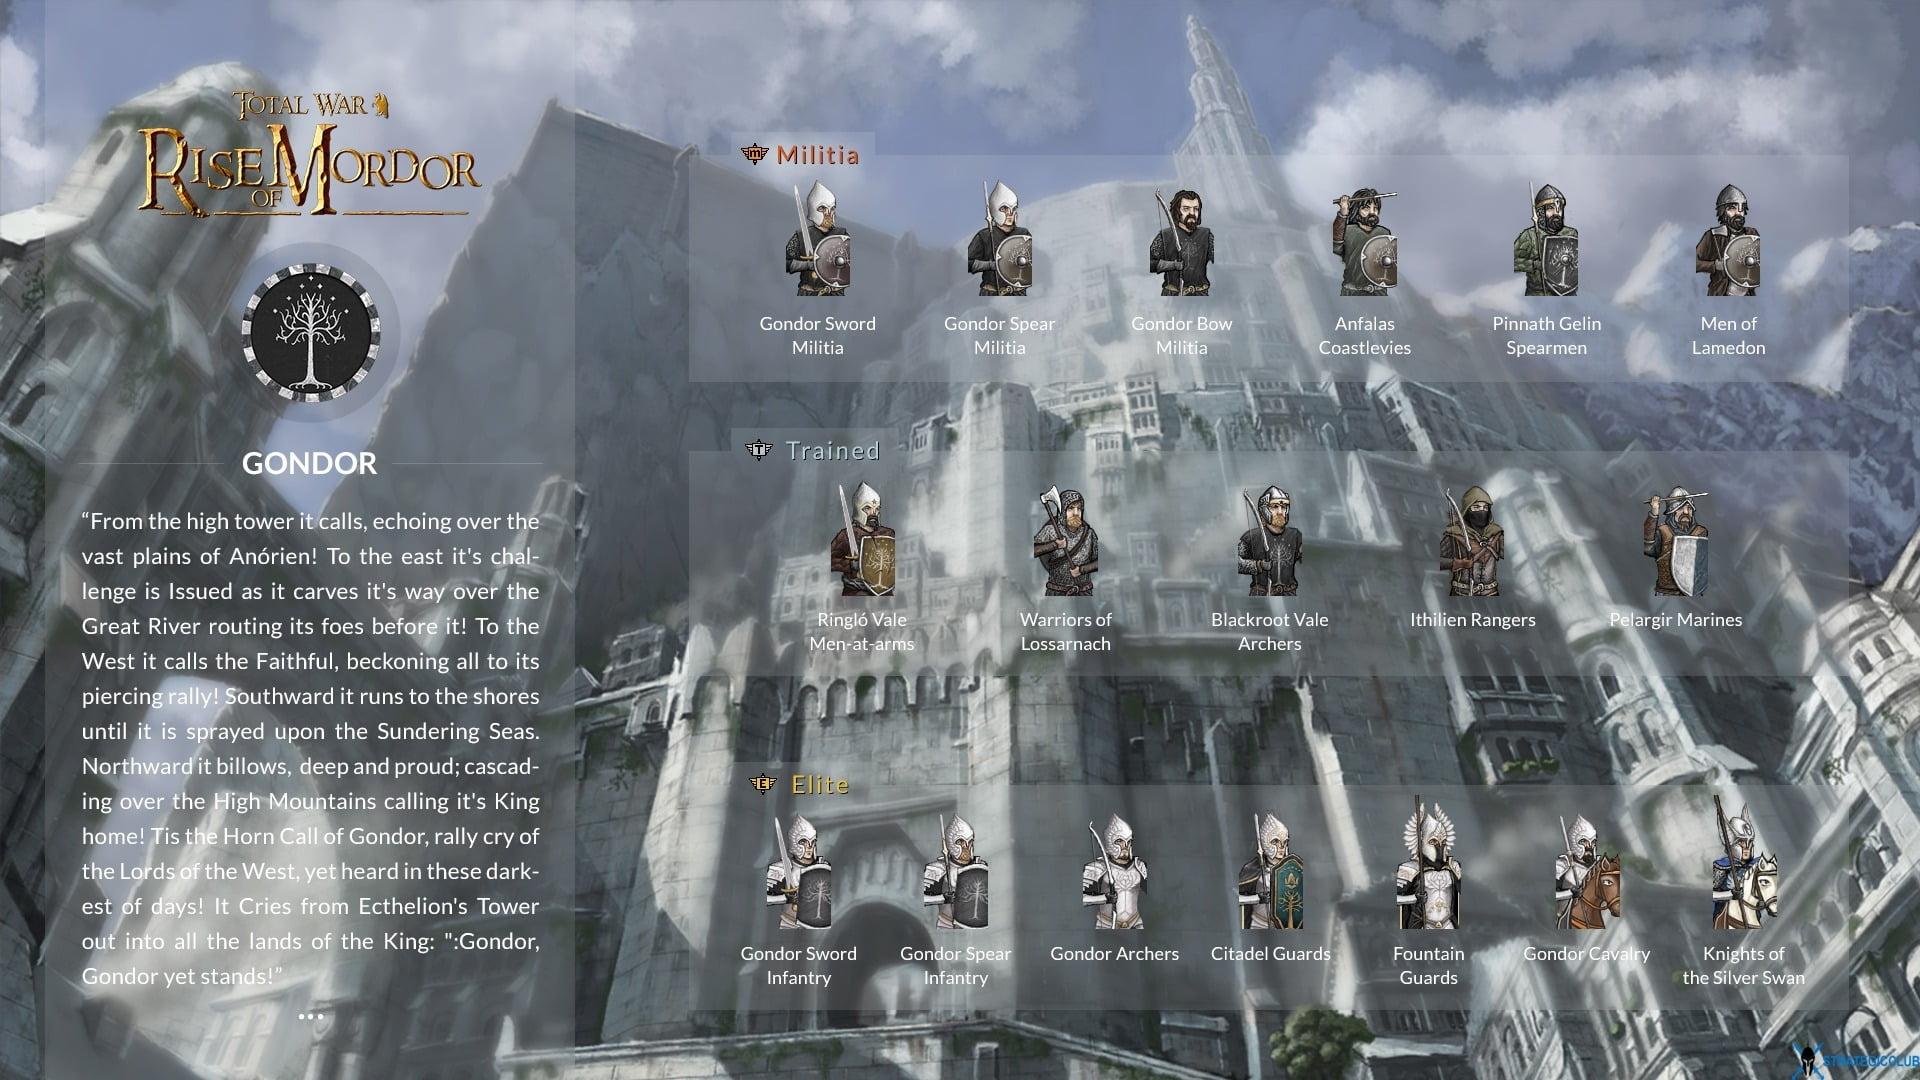 Gondor unit cards